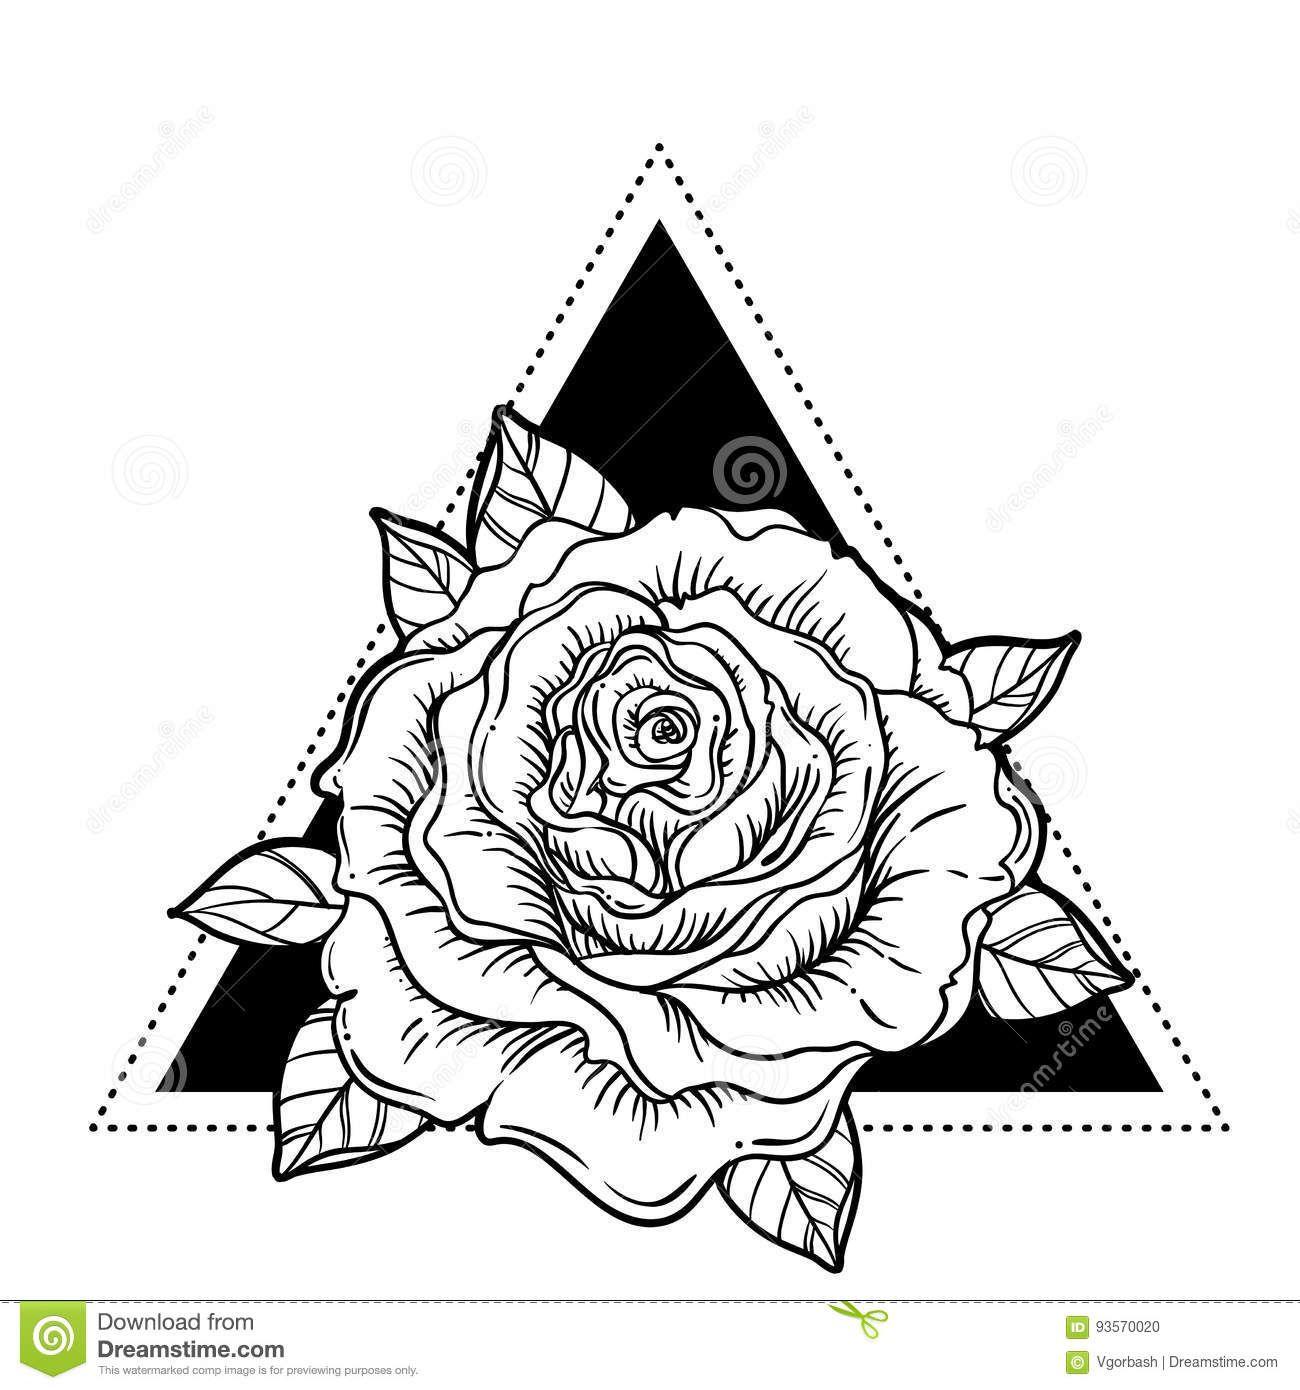 Rosicrucianism Symbol. Blackwork Tattoo Flash. All Seeing